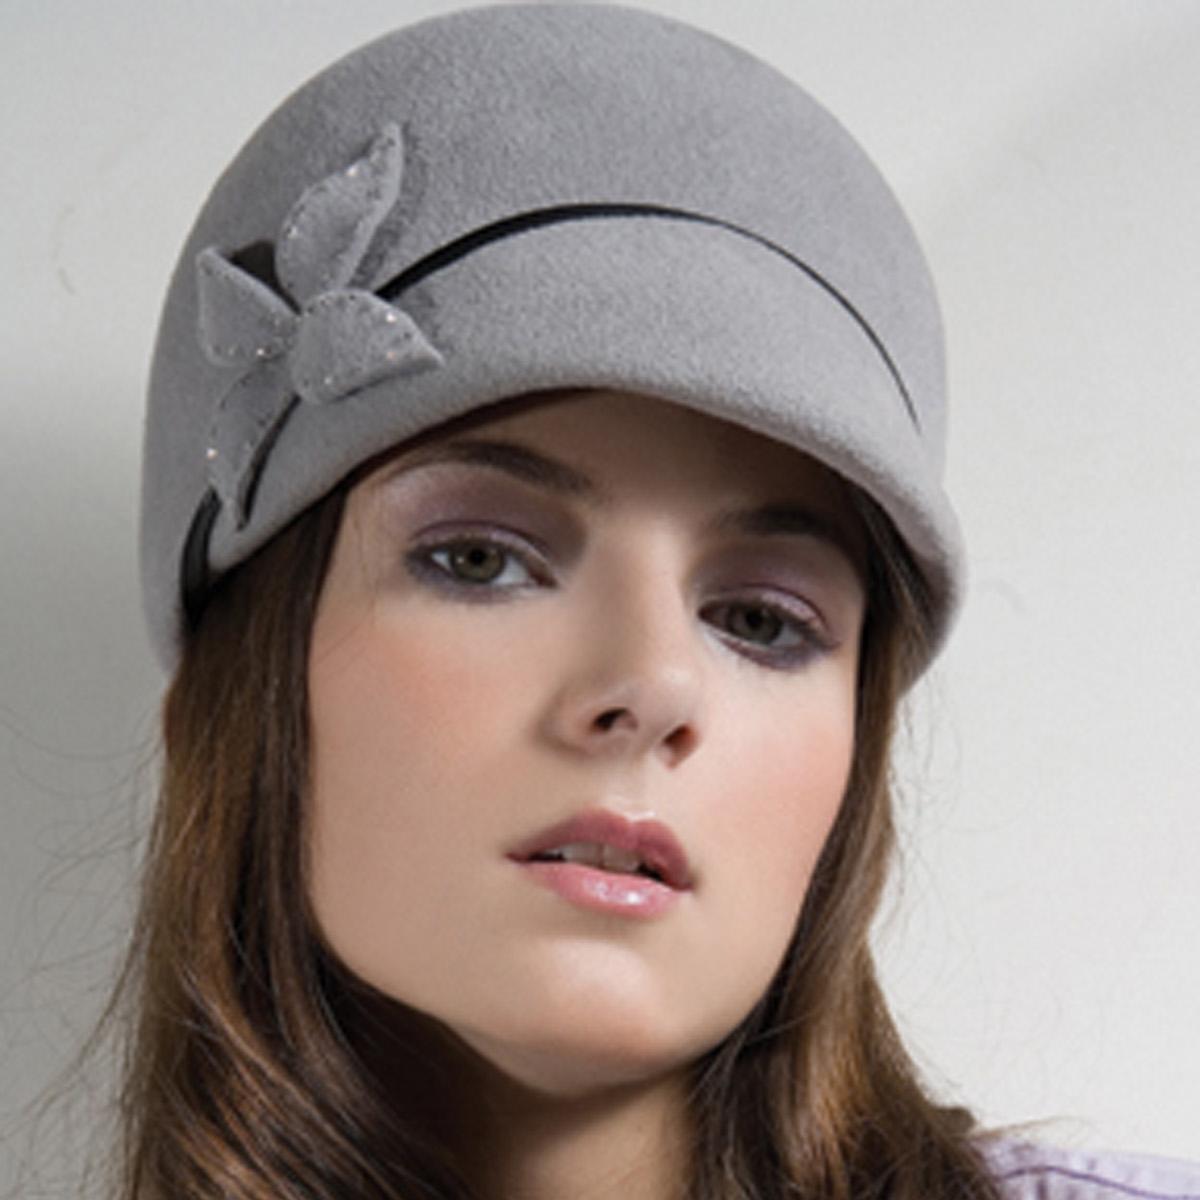 Artikal Handcrafted Millinery   Vintage Inspired Headwear